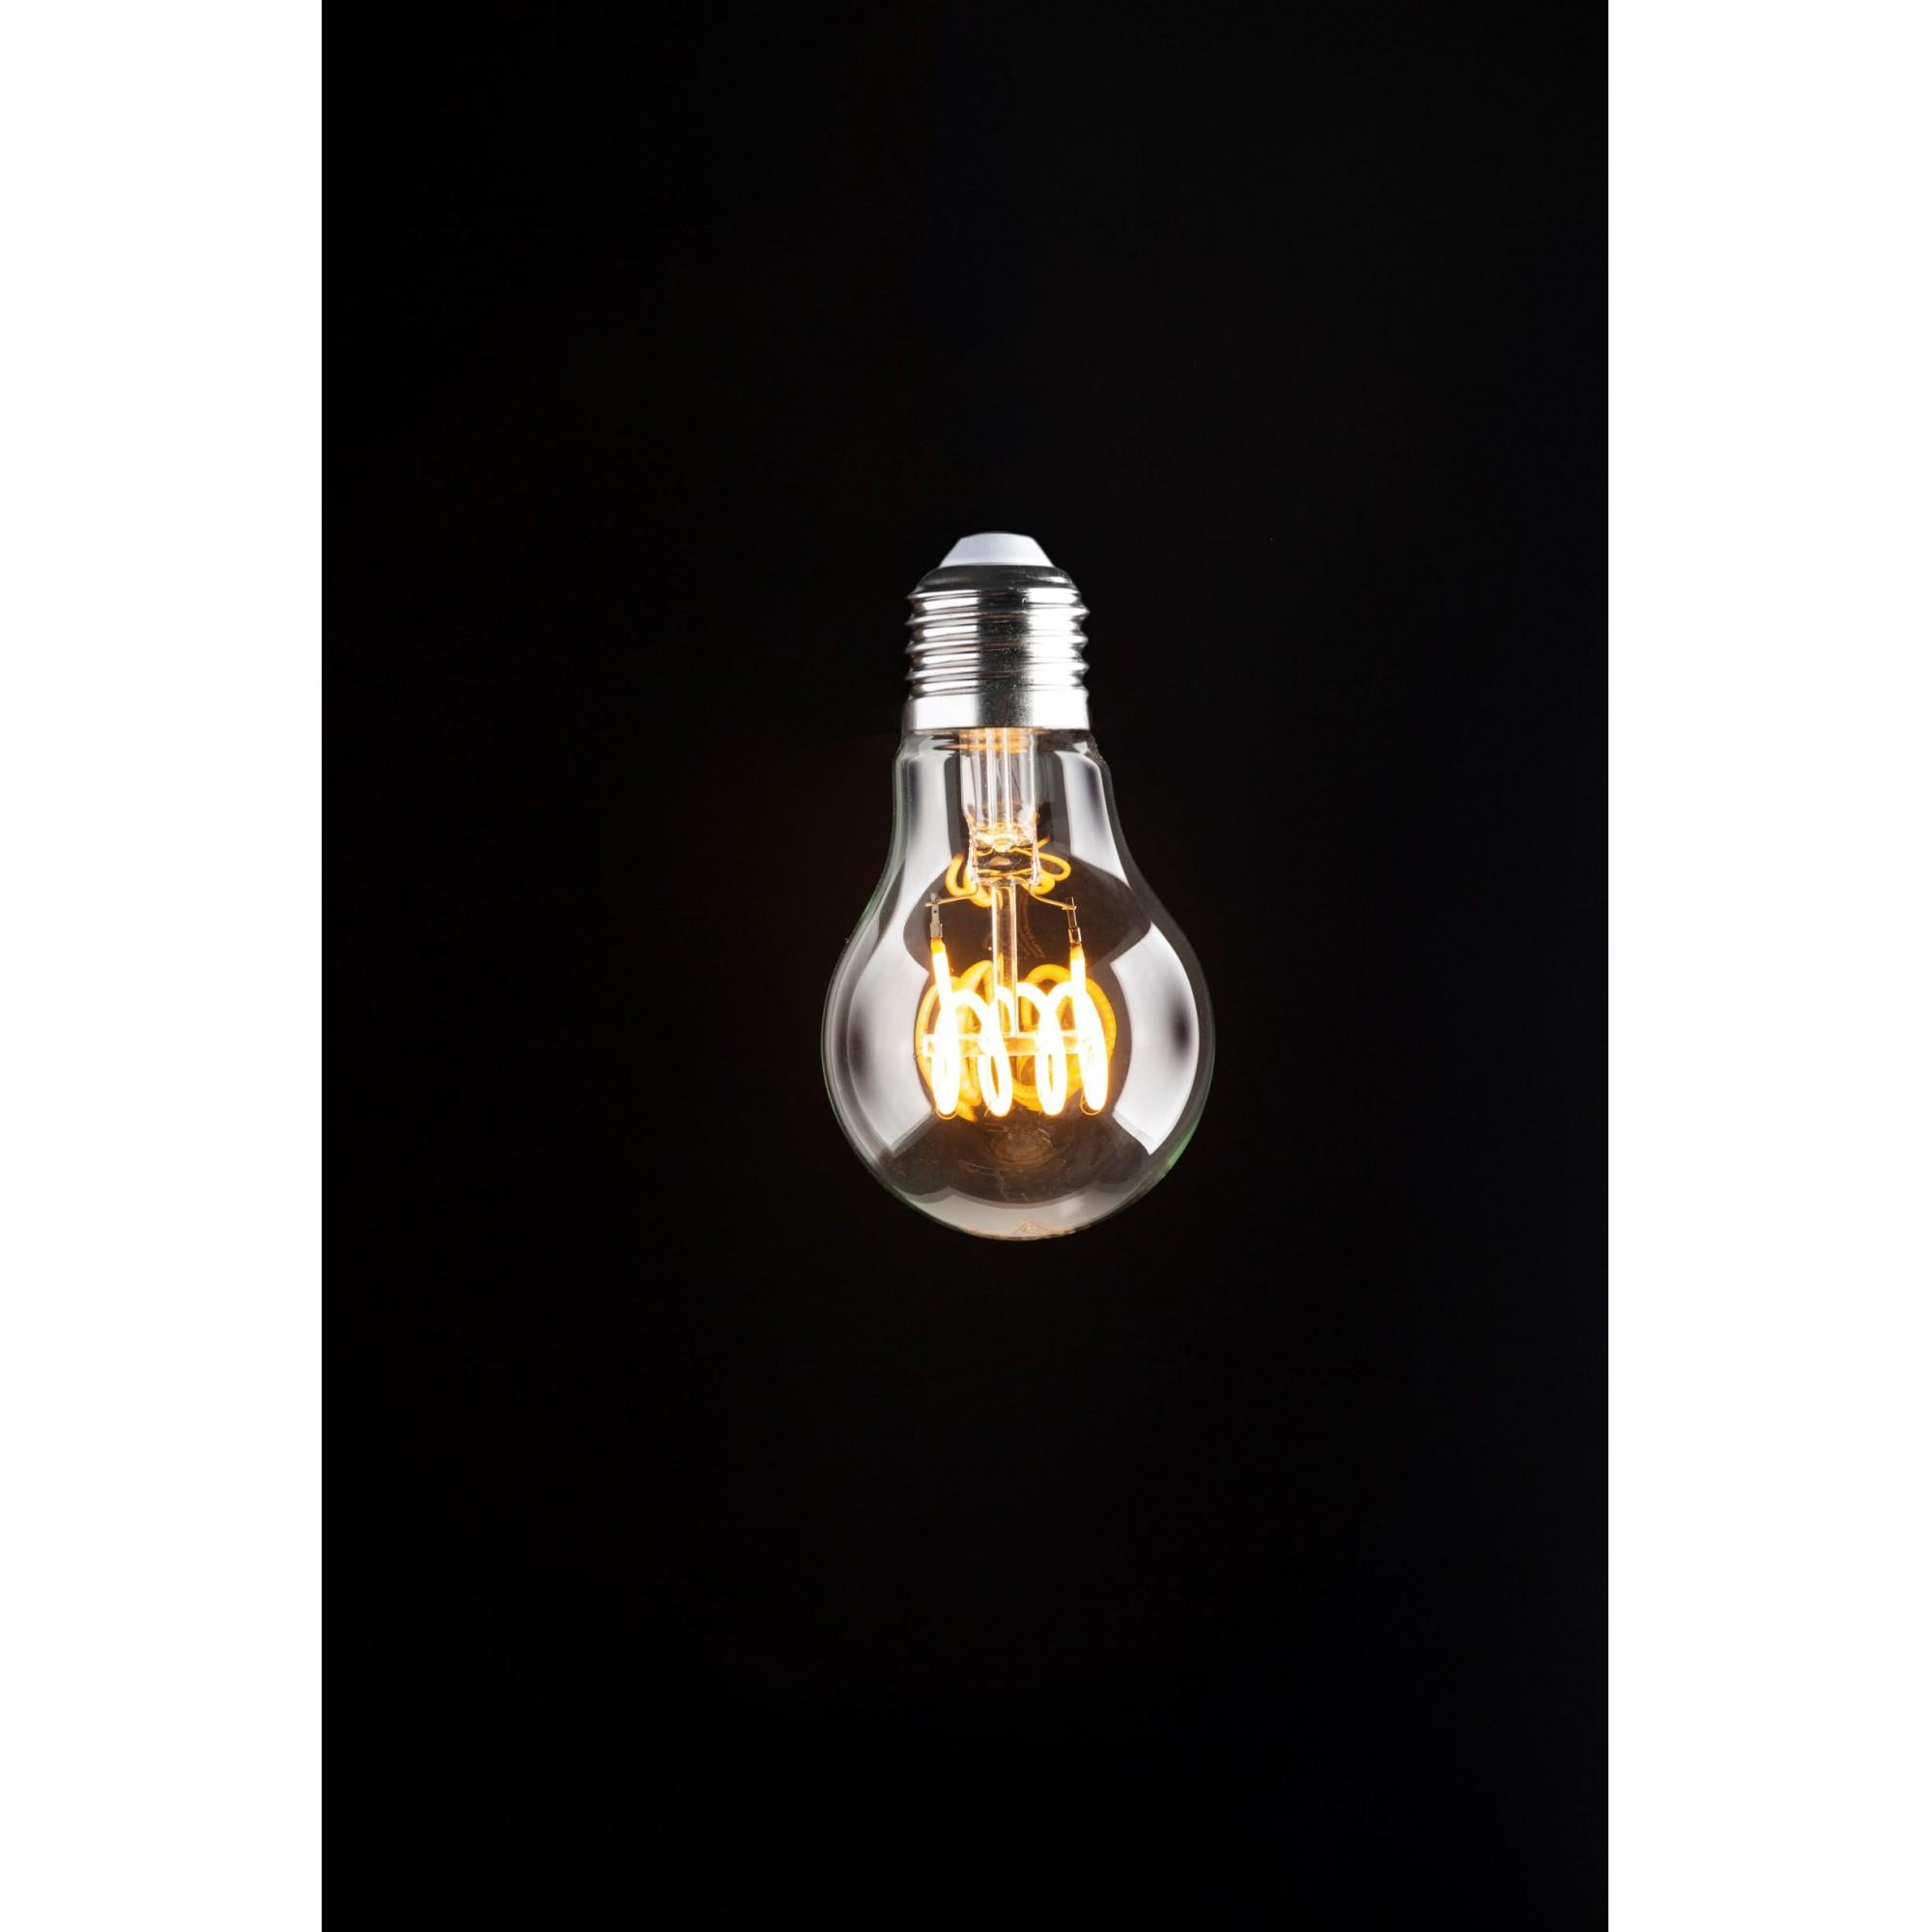 LAMPADA FILAMENTO LED VINTAGE SPIRAL VIDRO CLEAR TAMANHO PADRÃO 110 V